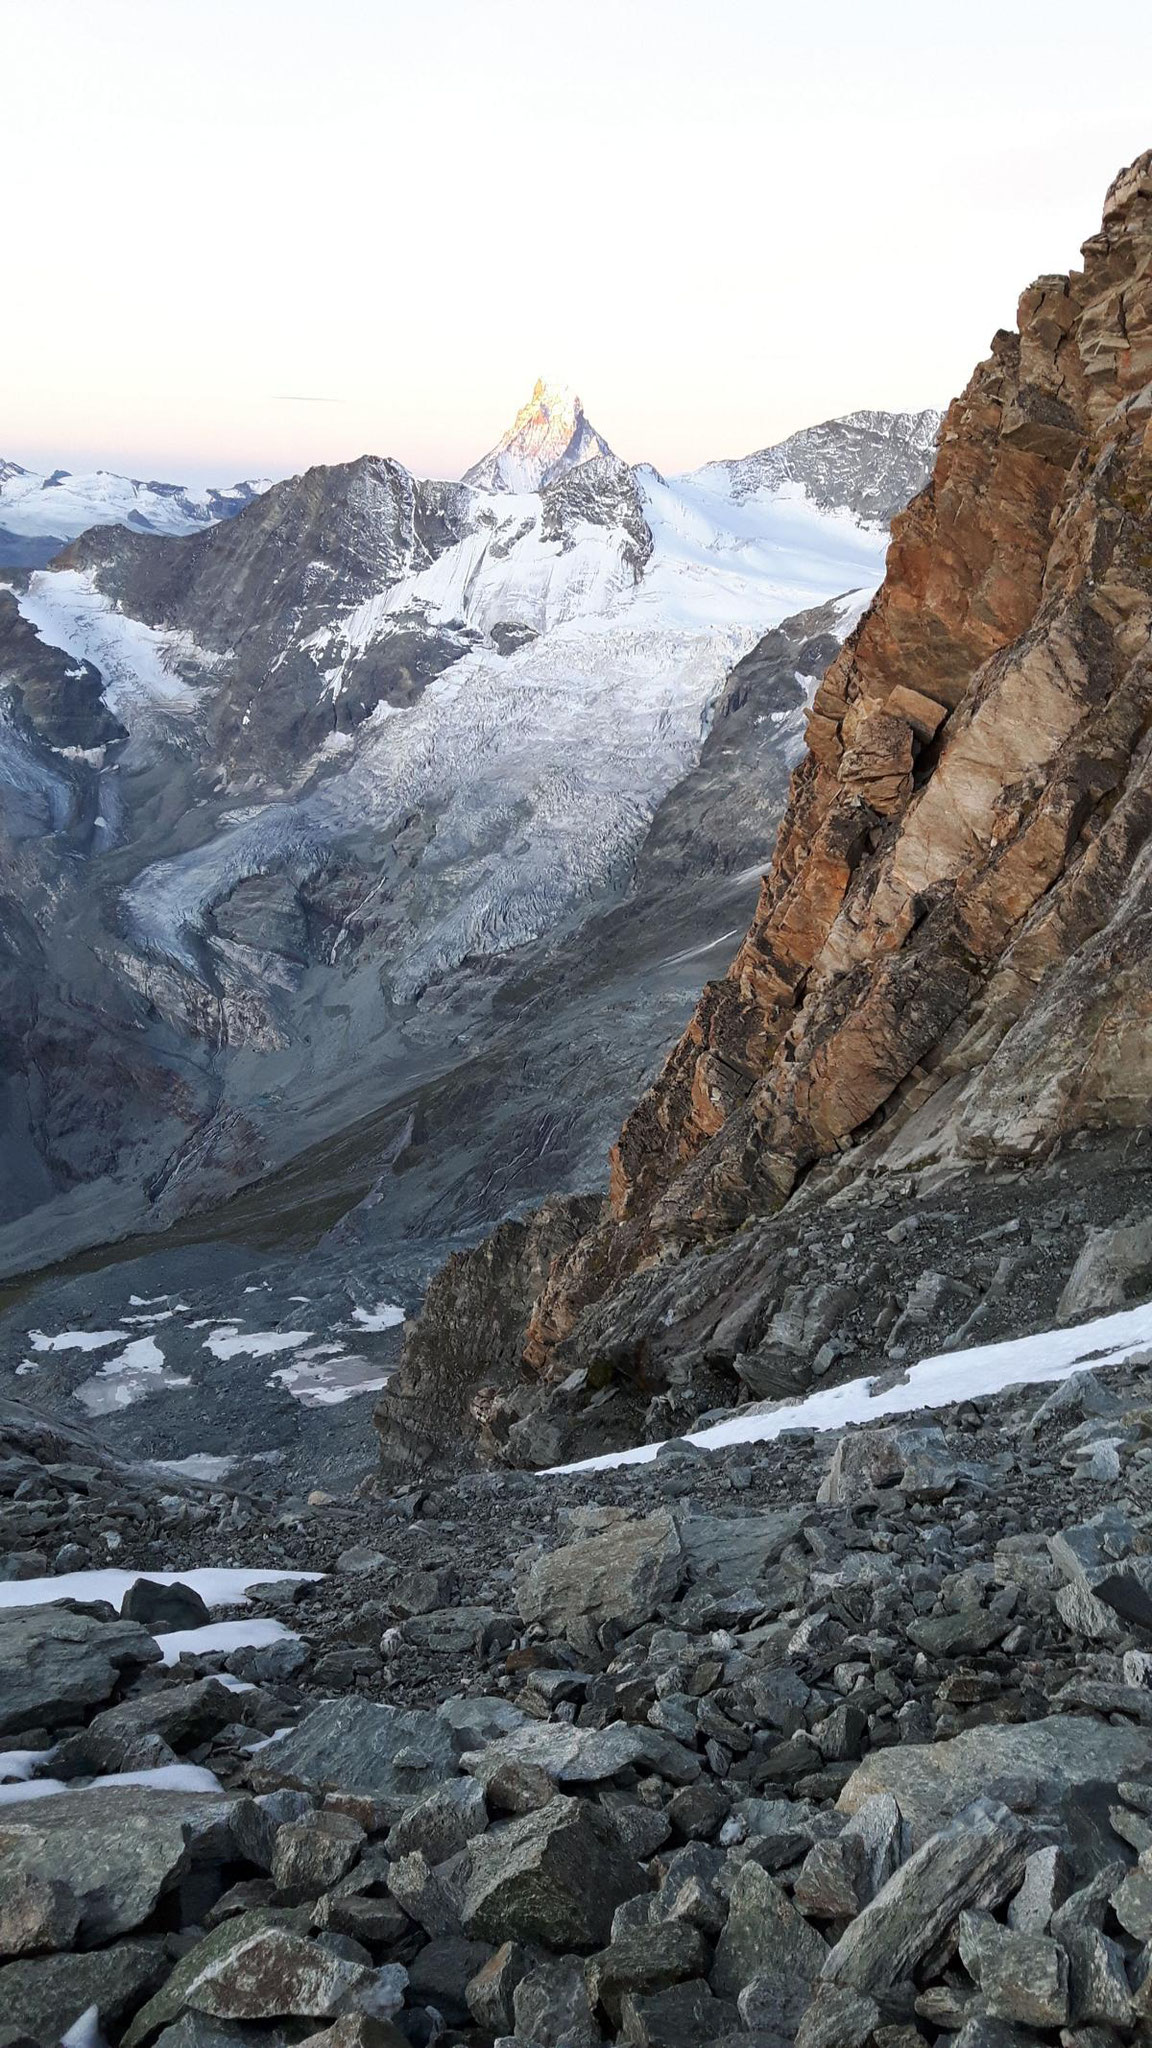 Blick vom Weisshorn-Ostgrat zum Matterhorn